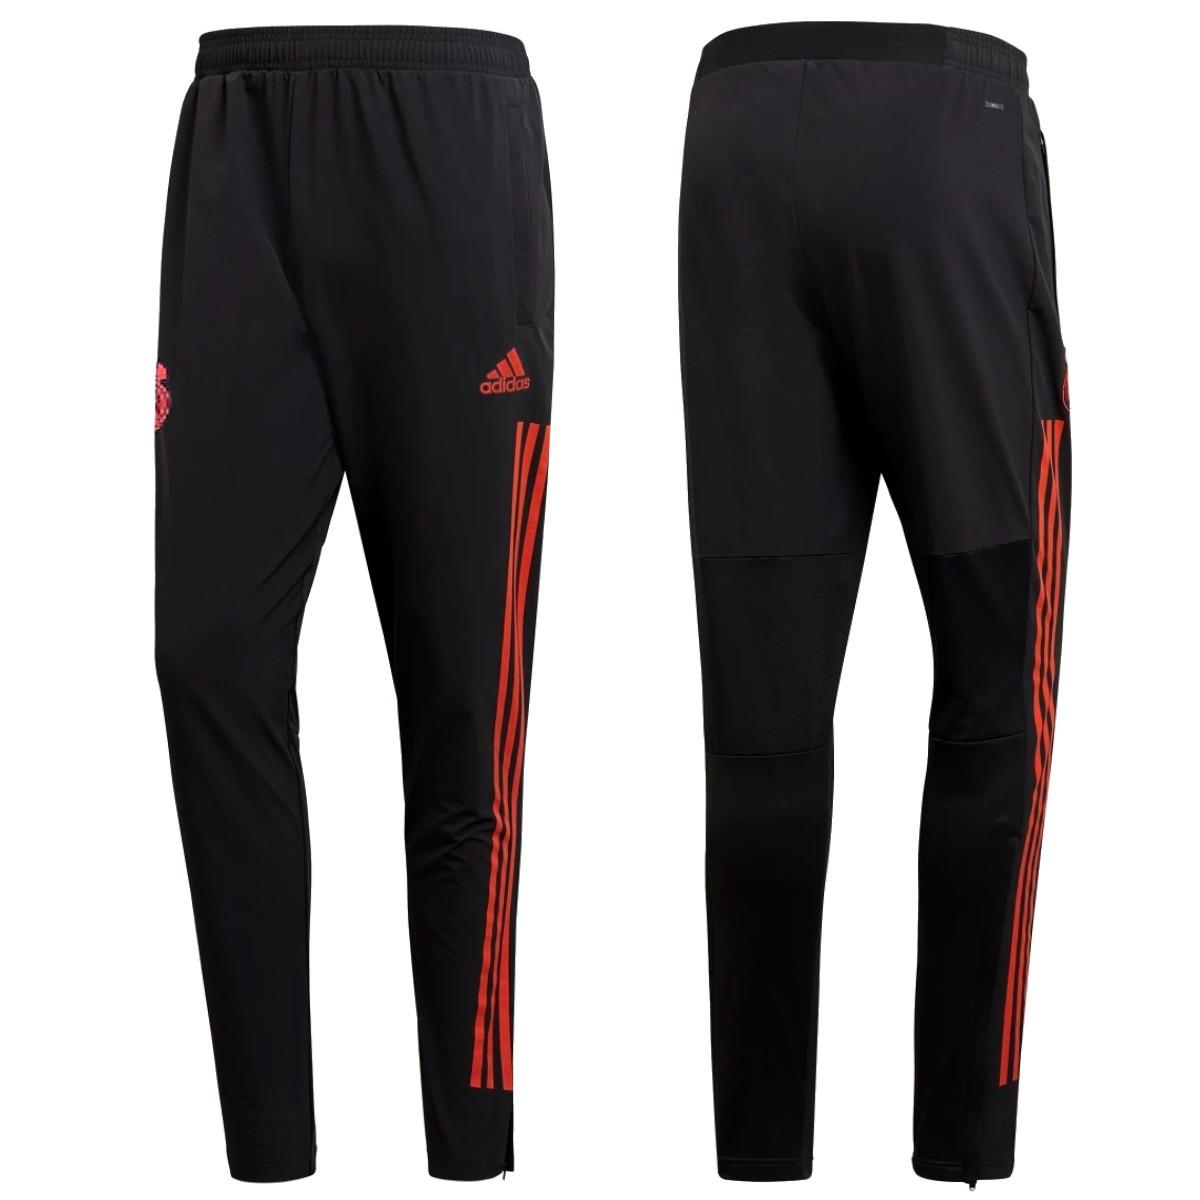 Real Madrid Pants Adidas Cheap Online